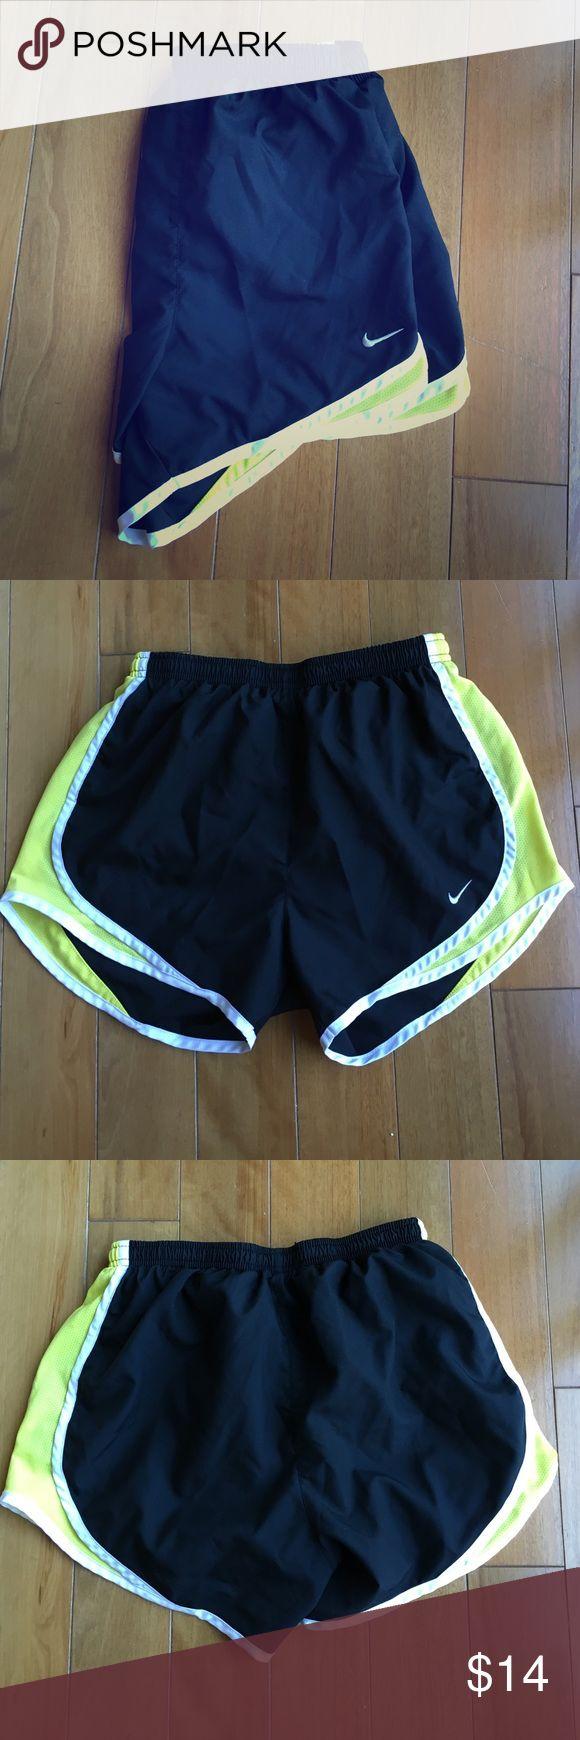 Nike Dri-Fit Shorts XS Nike Dri-Fit shorts. Black, yellow, and white. Only worn a couple times. Nike Shorts